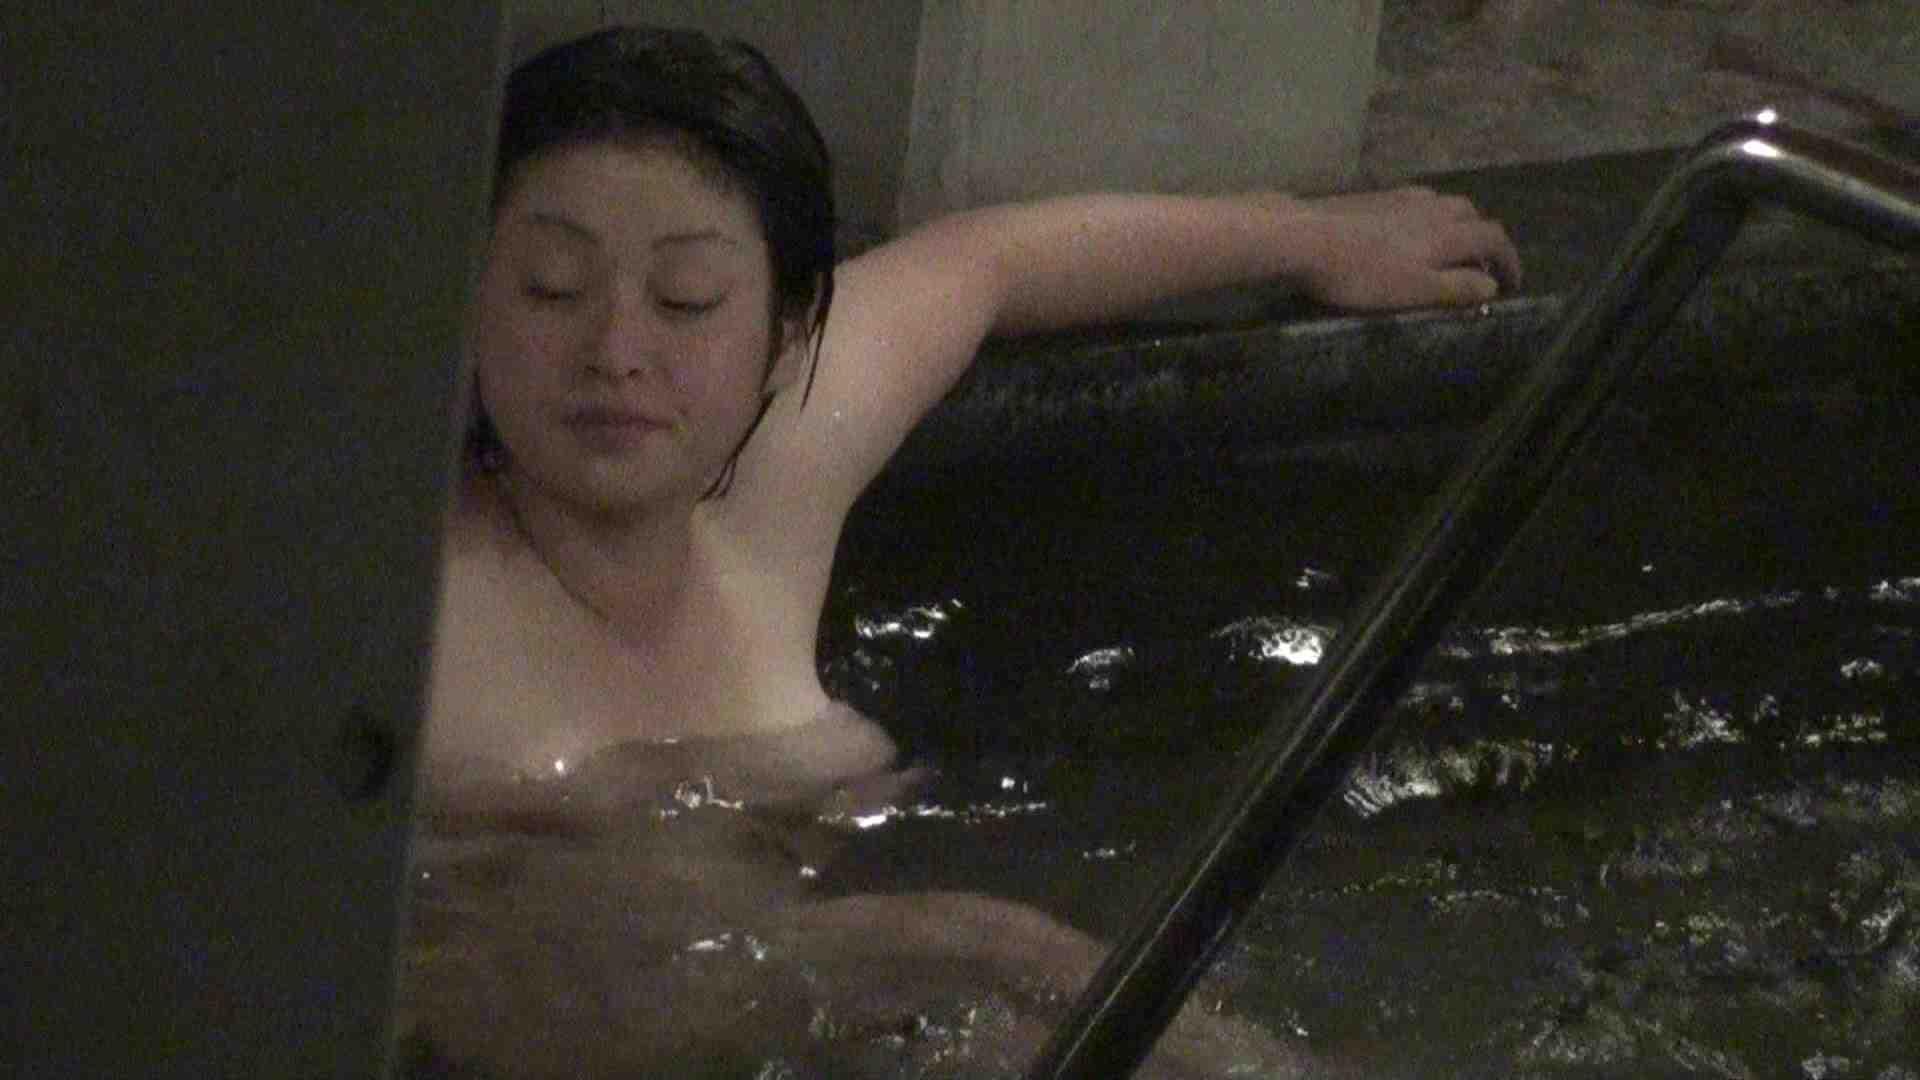 Aquaな露天風呂Vol.338 露天風呂編  82PIX 50